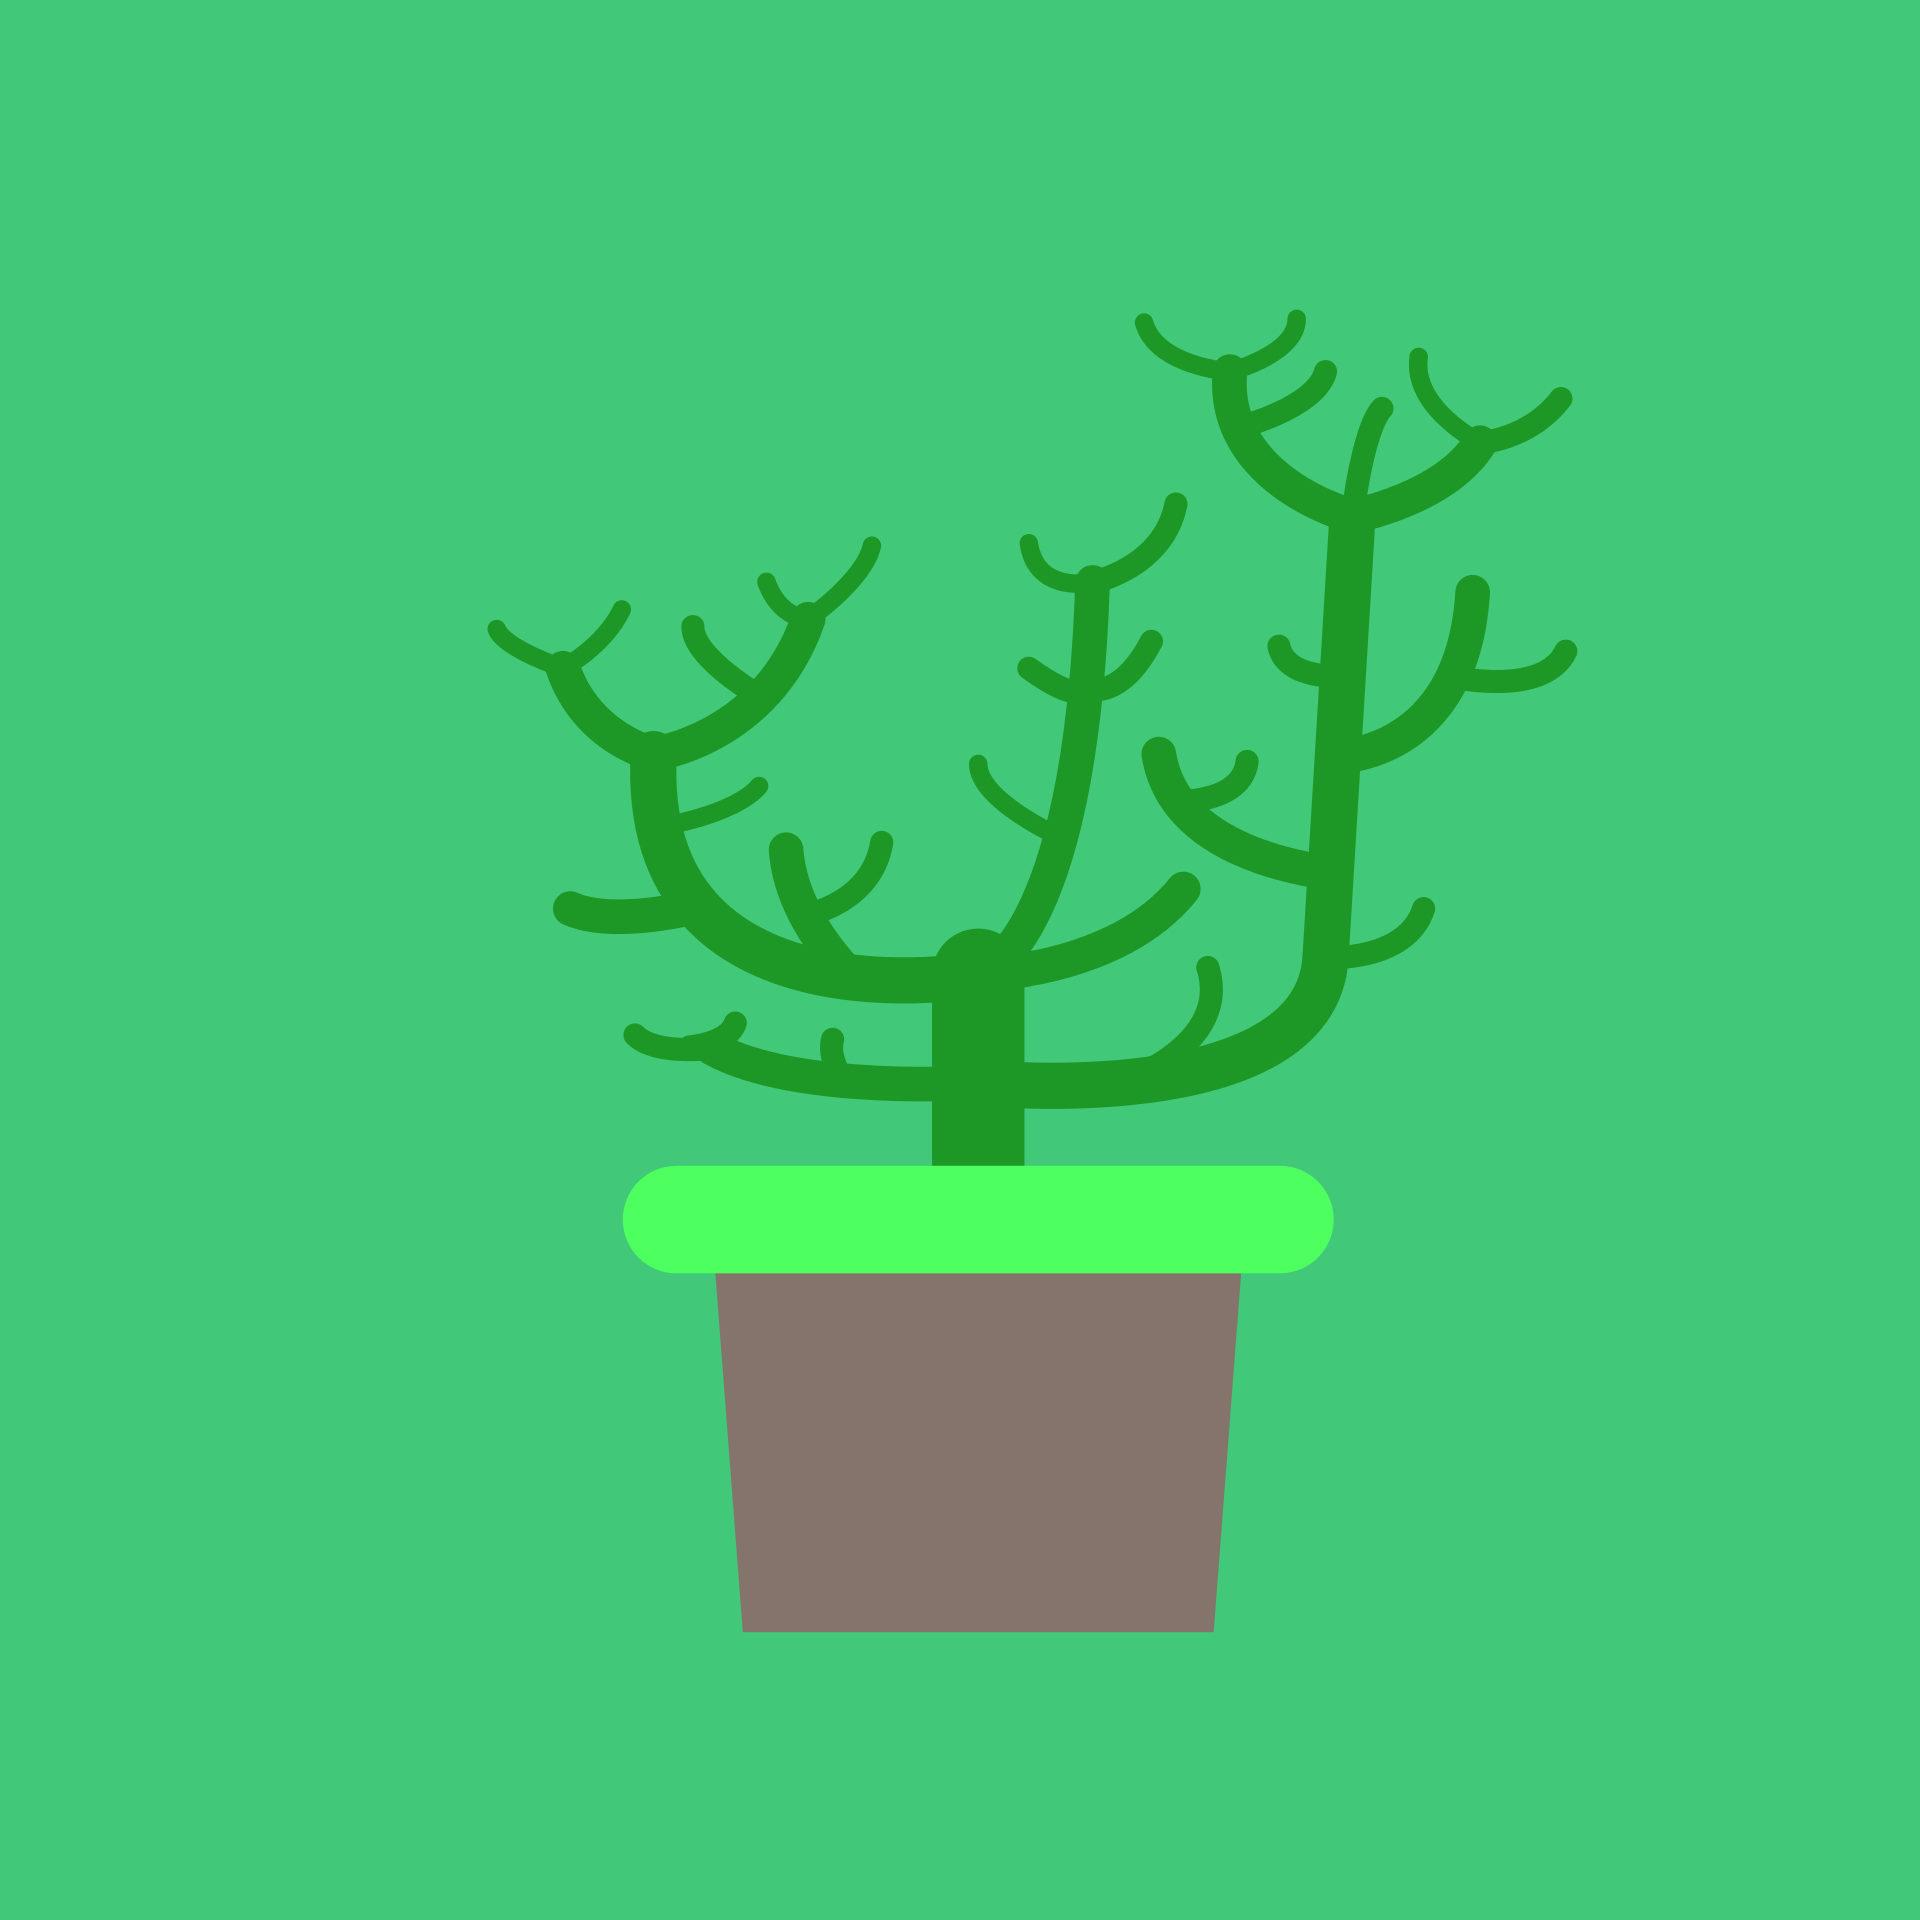 rez de chaussée, pot, Cactus, Vert, Brown - Fonds d'écran HD - Professor-falken.com